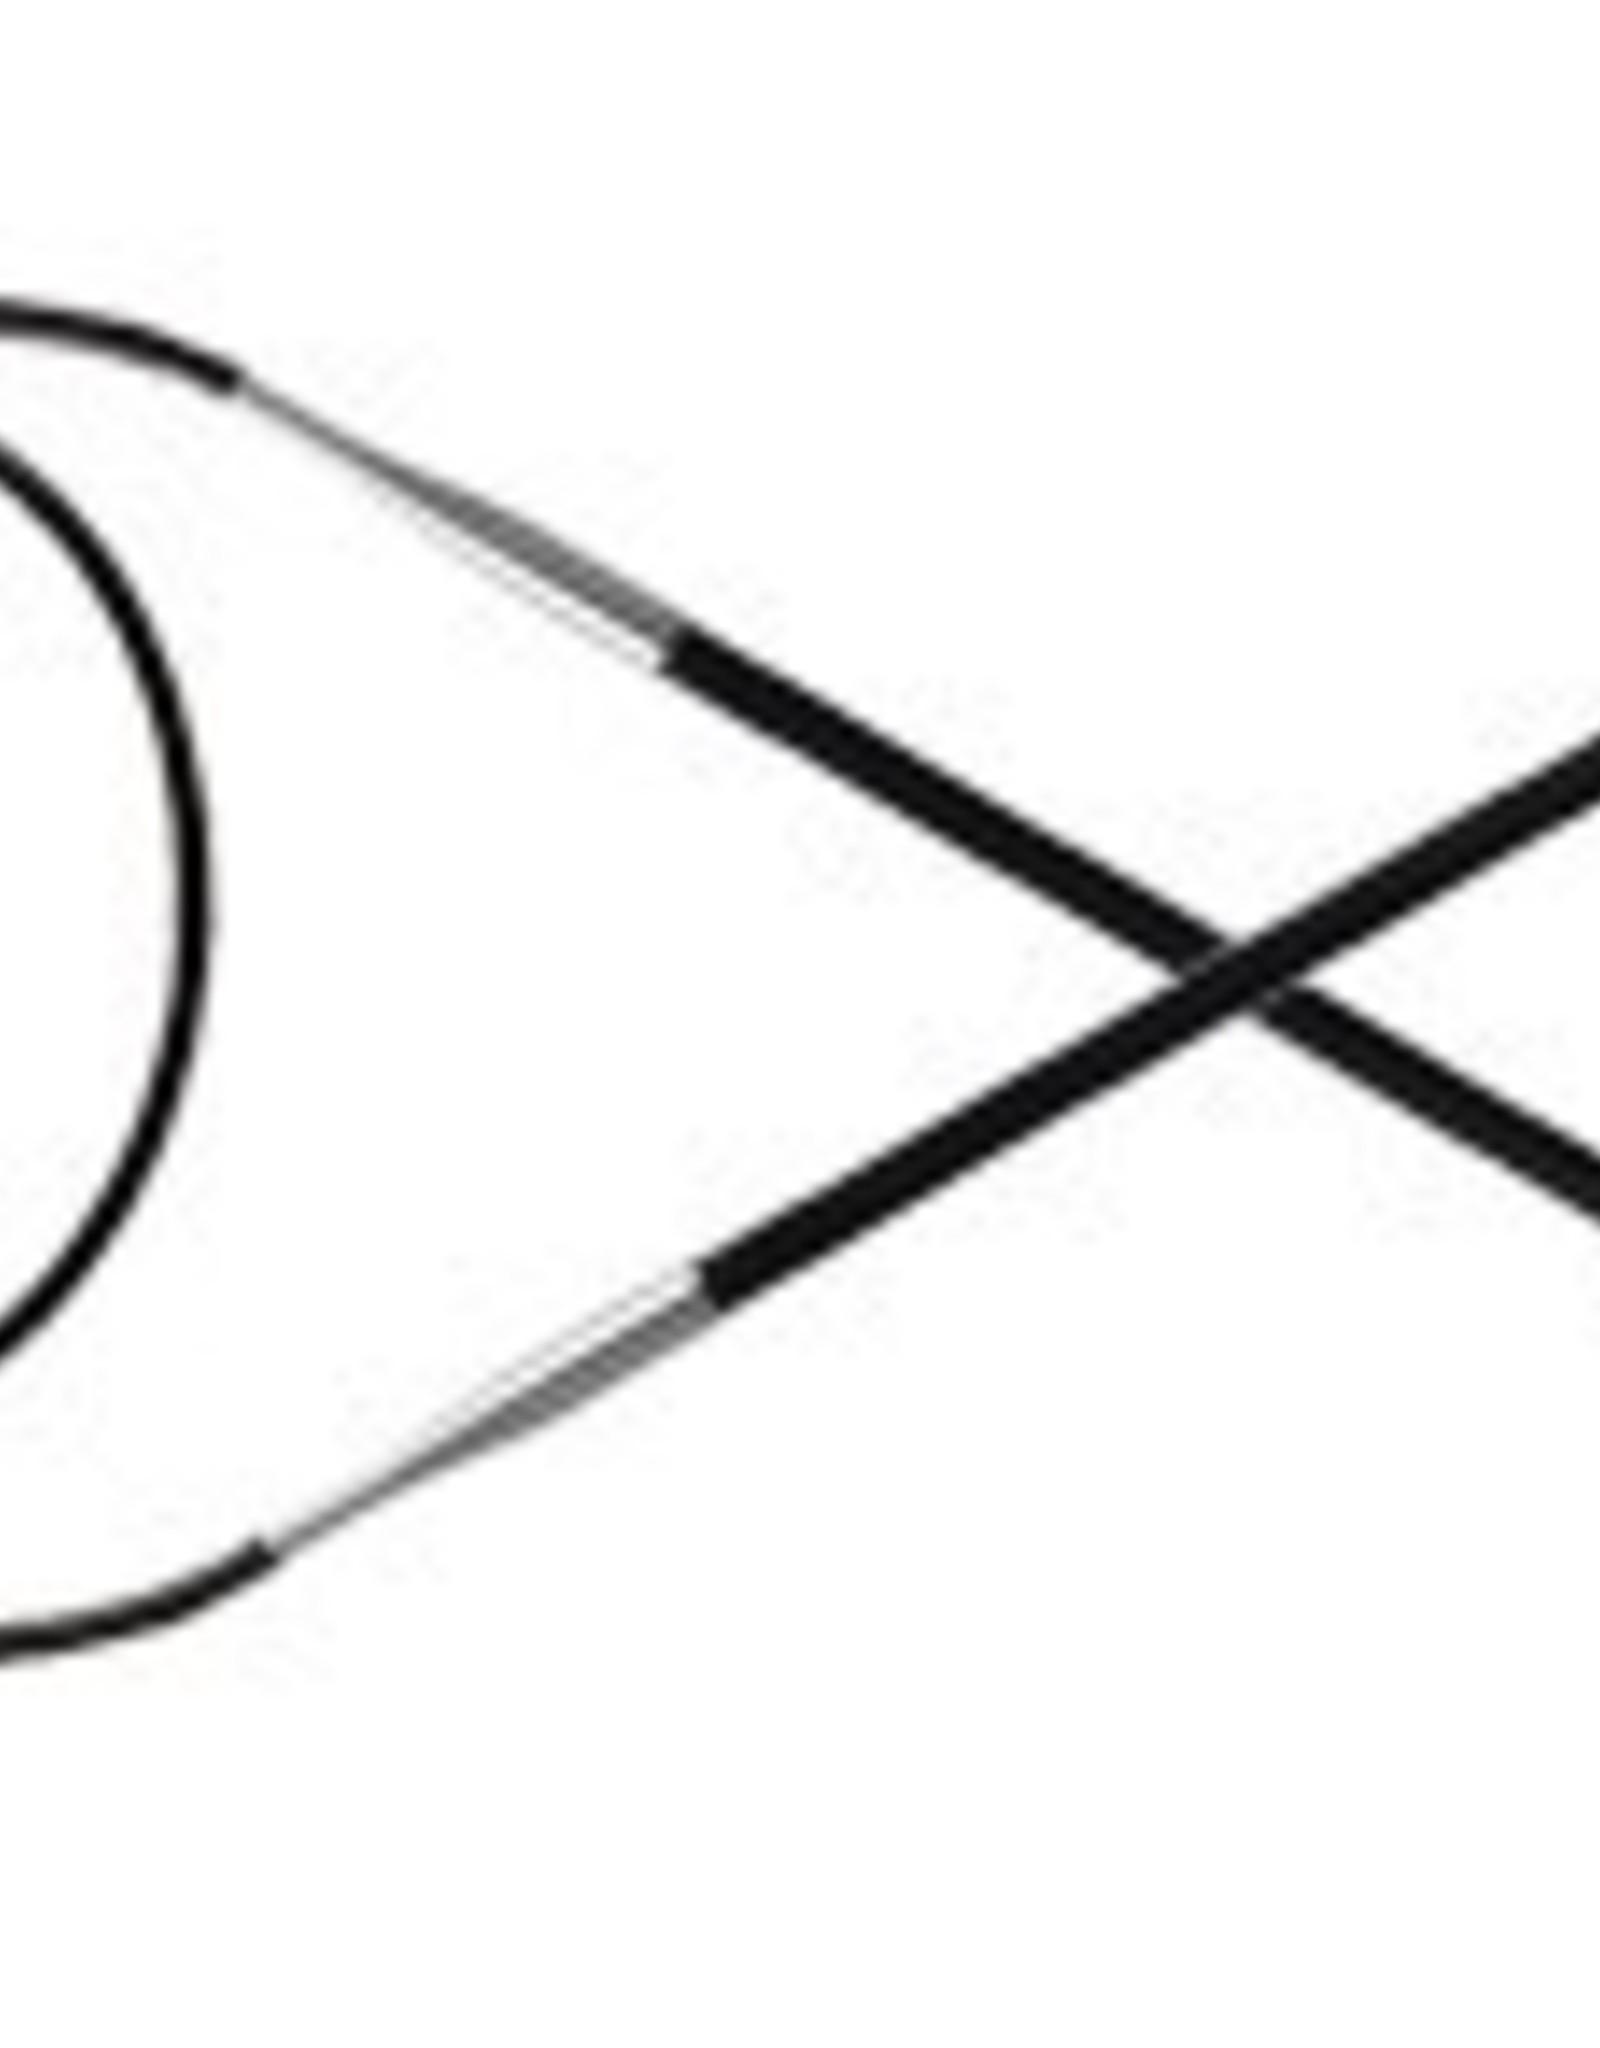 Knitter's Pride 2 Karbonz Circular 16